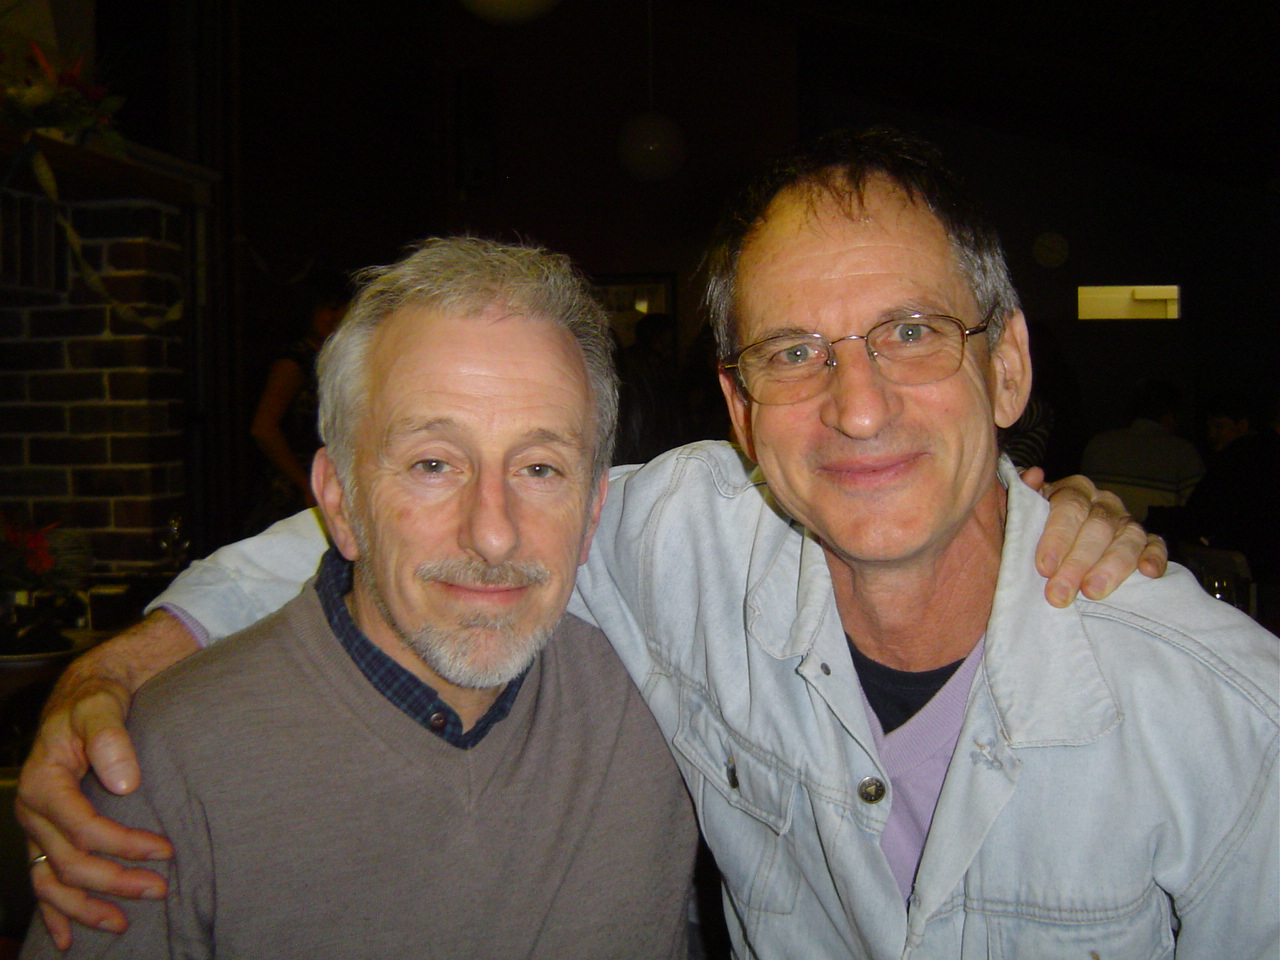 Tony Smitberg Sensei & Dominique Perrotin.JPG